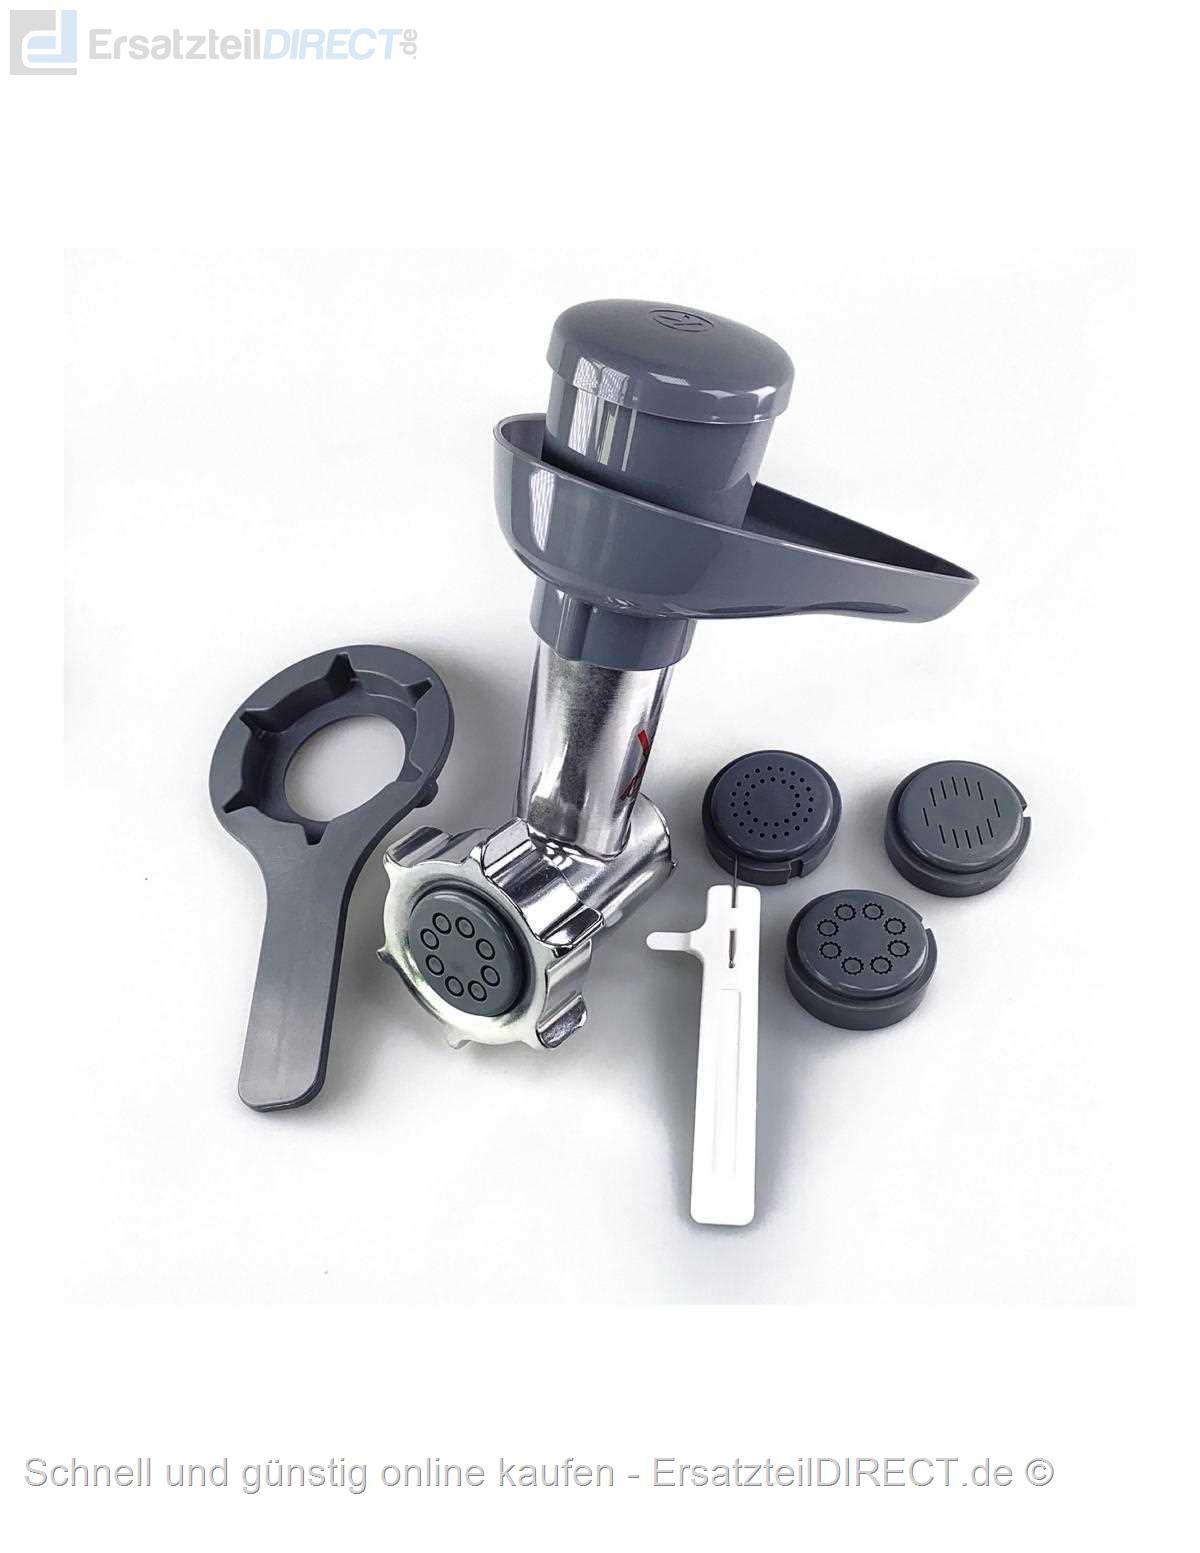 kenwood kuchenmaschine pasta maker khh326wh